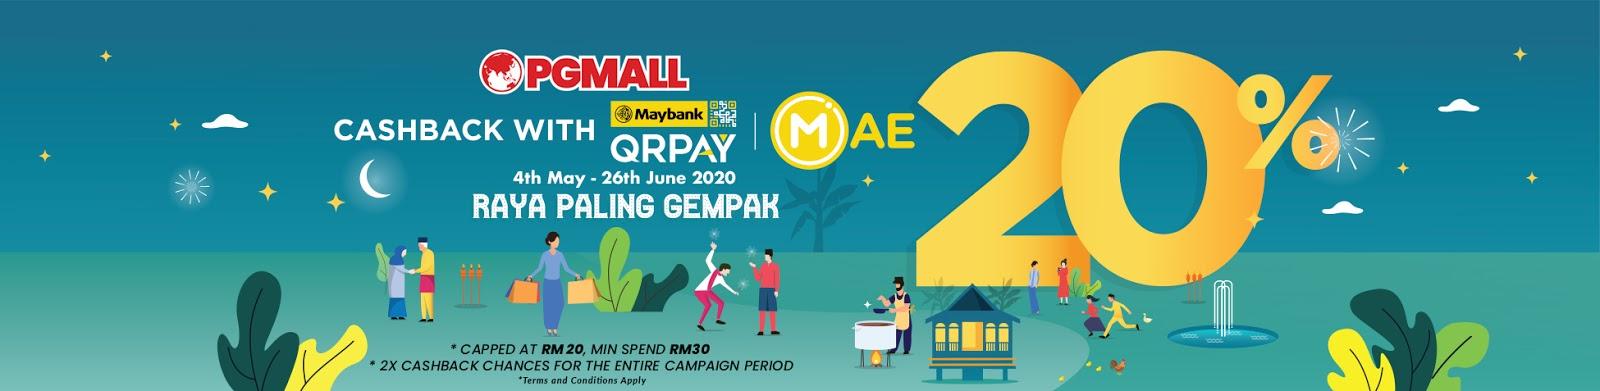 pg mall maybank qrpay cashback